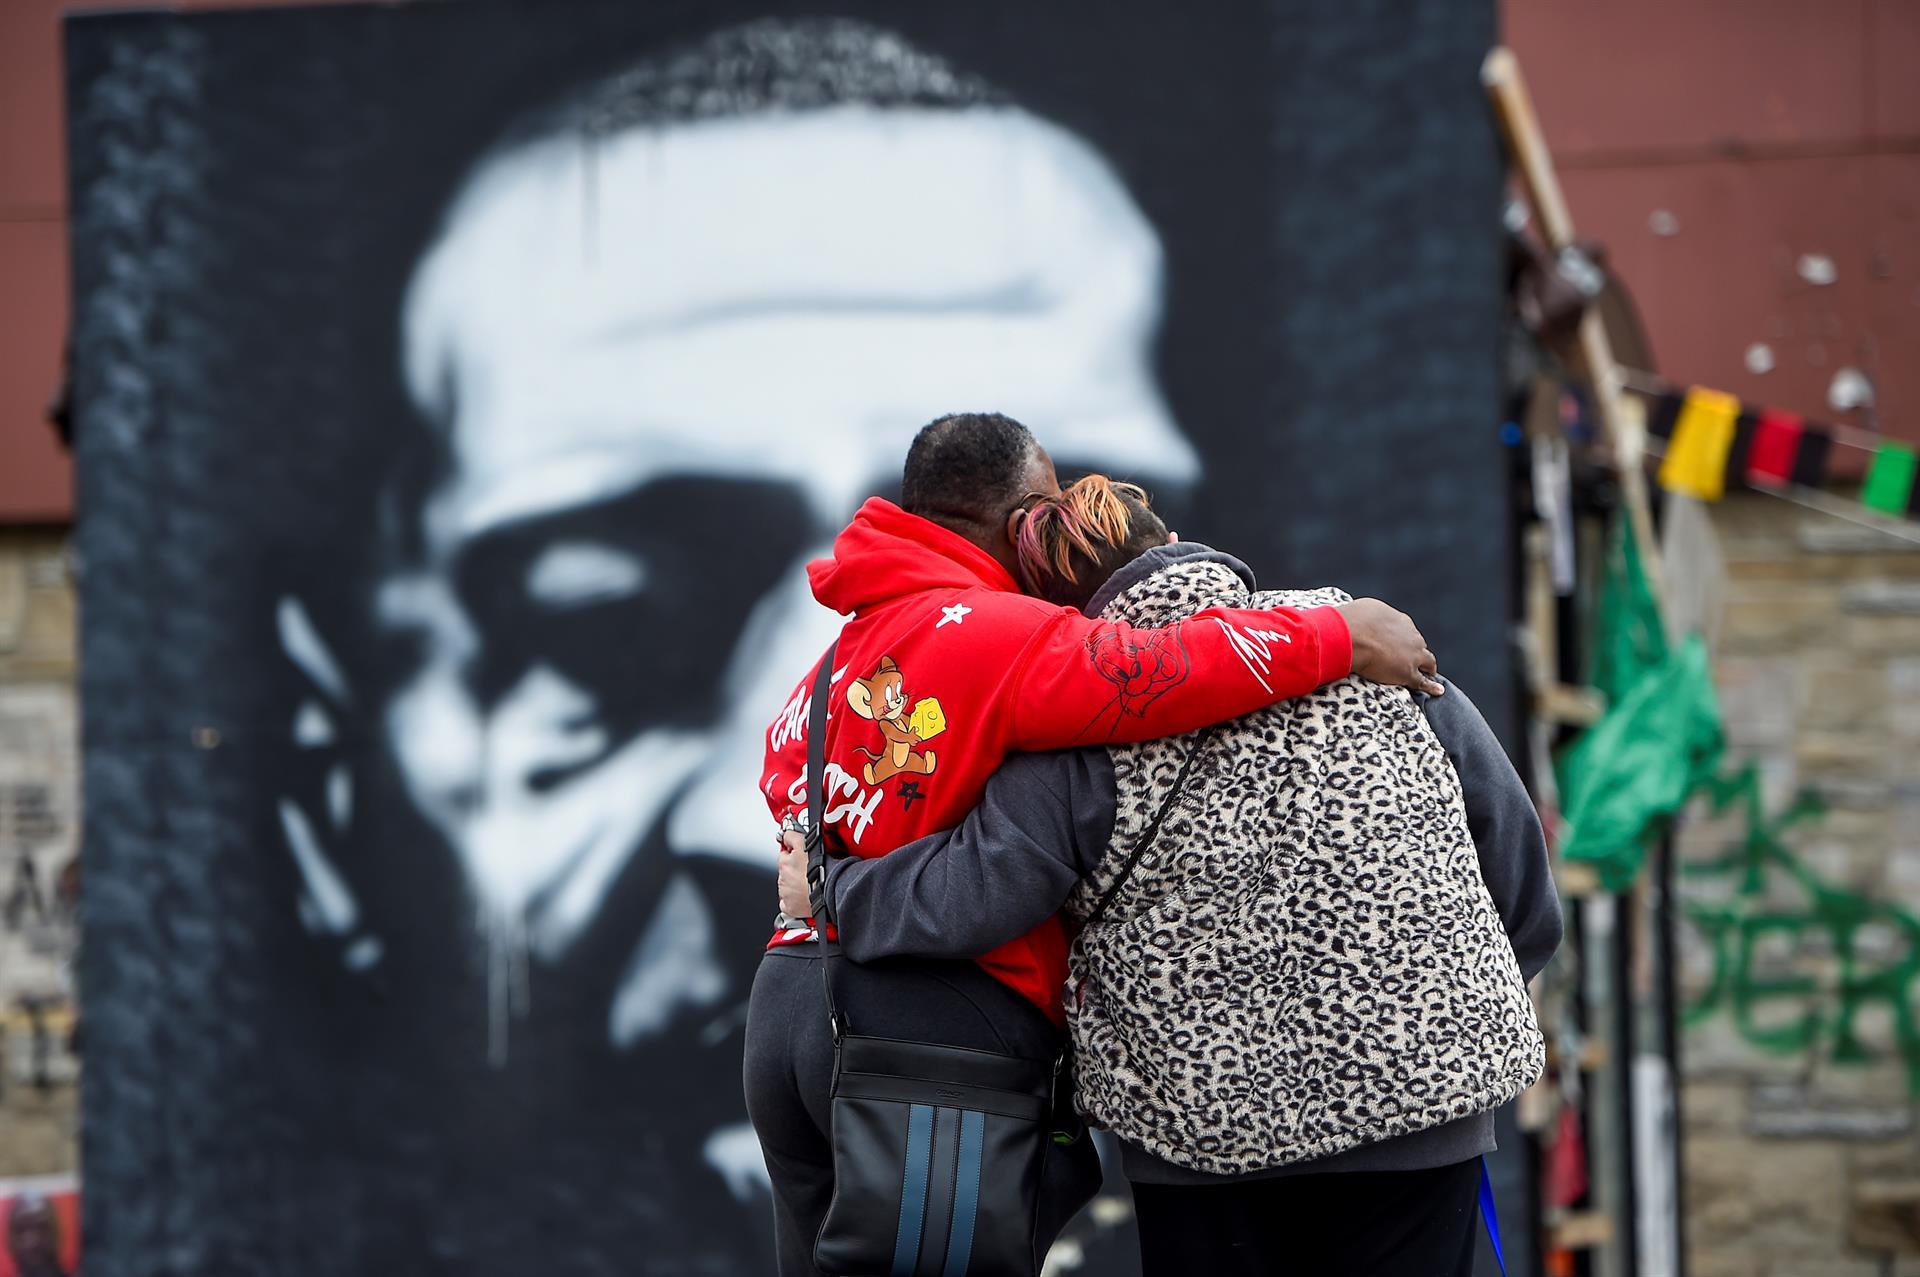 Casal observa mural que homenageia George Floyd